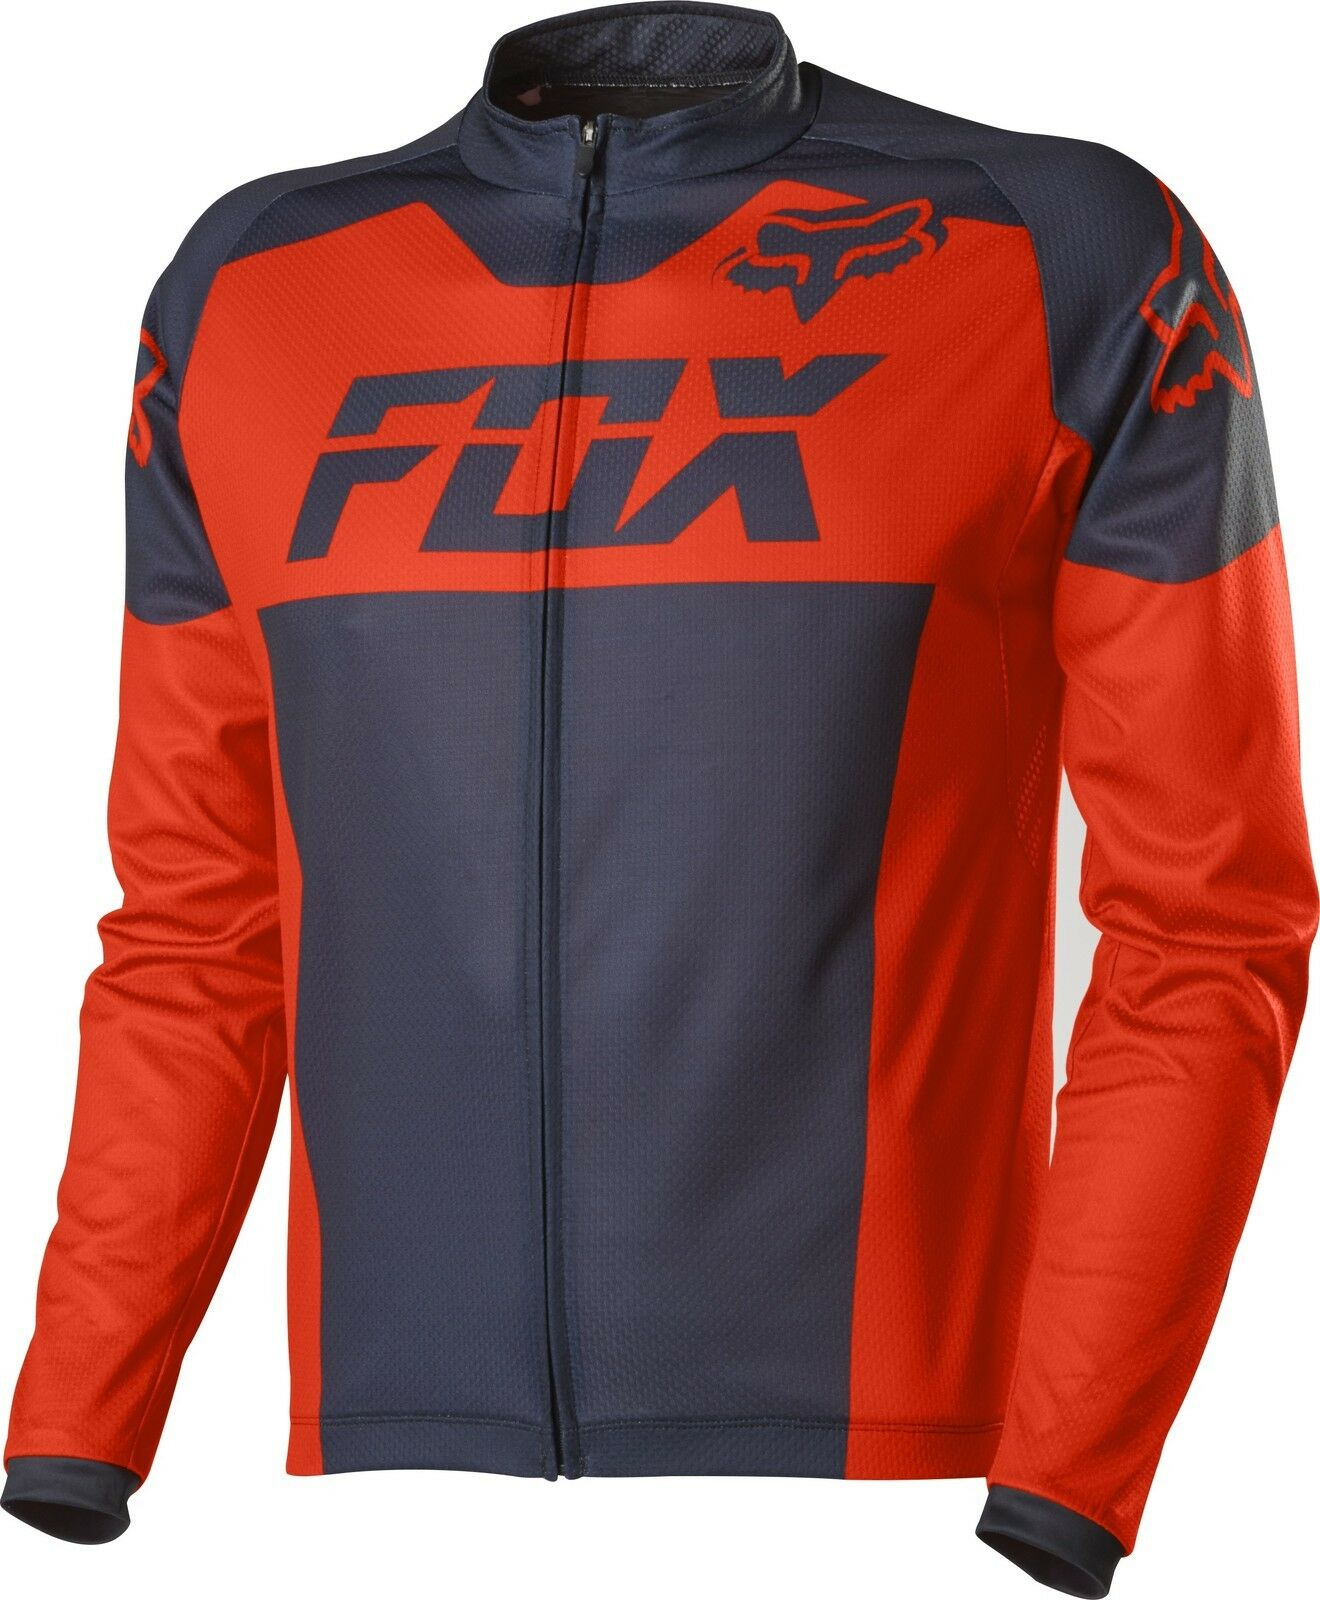 Fox Racing 2015 Livewire Race Mako L S Long Sleeve Jersey Flo Orange